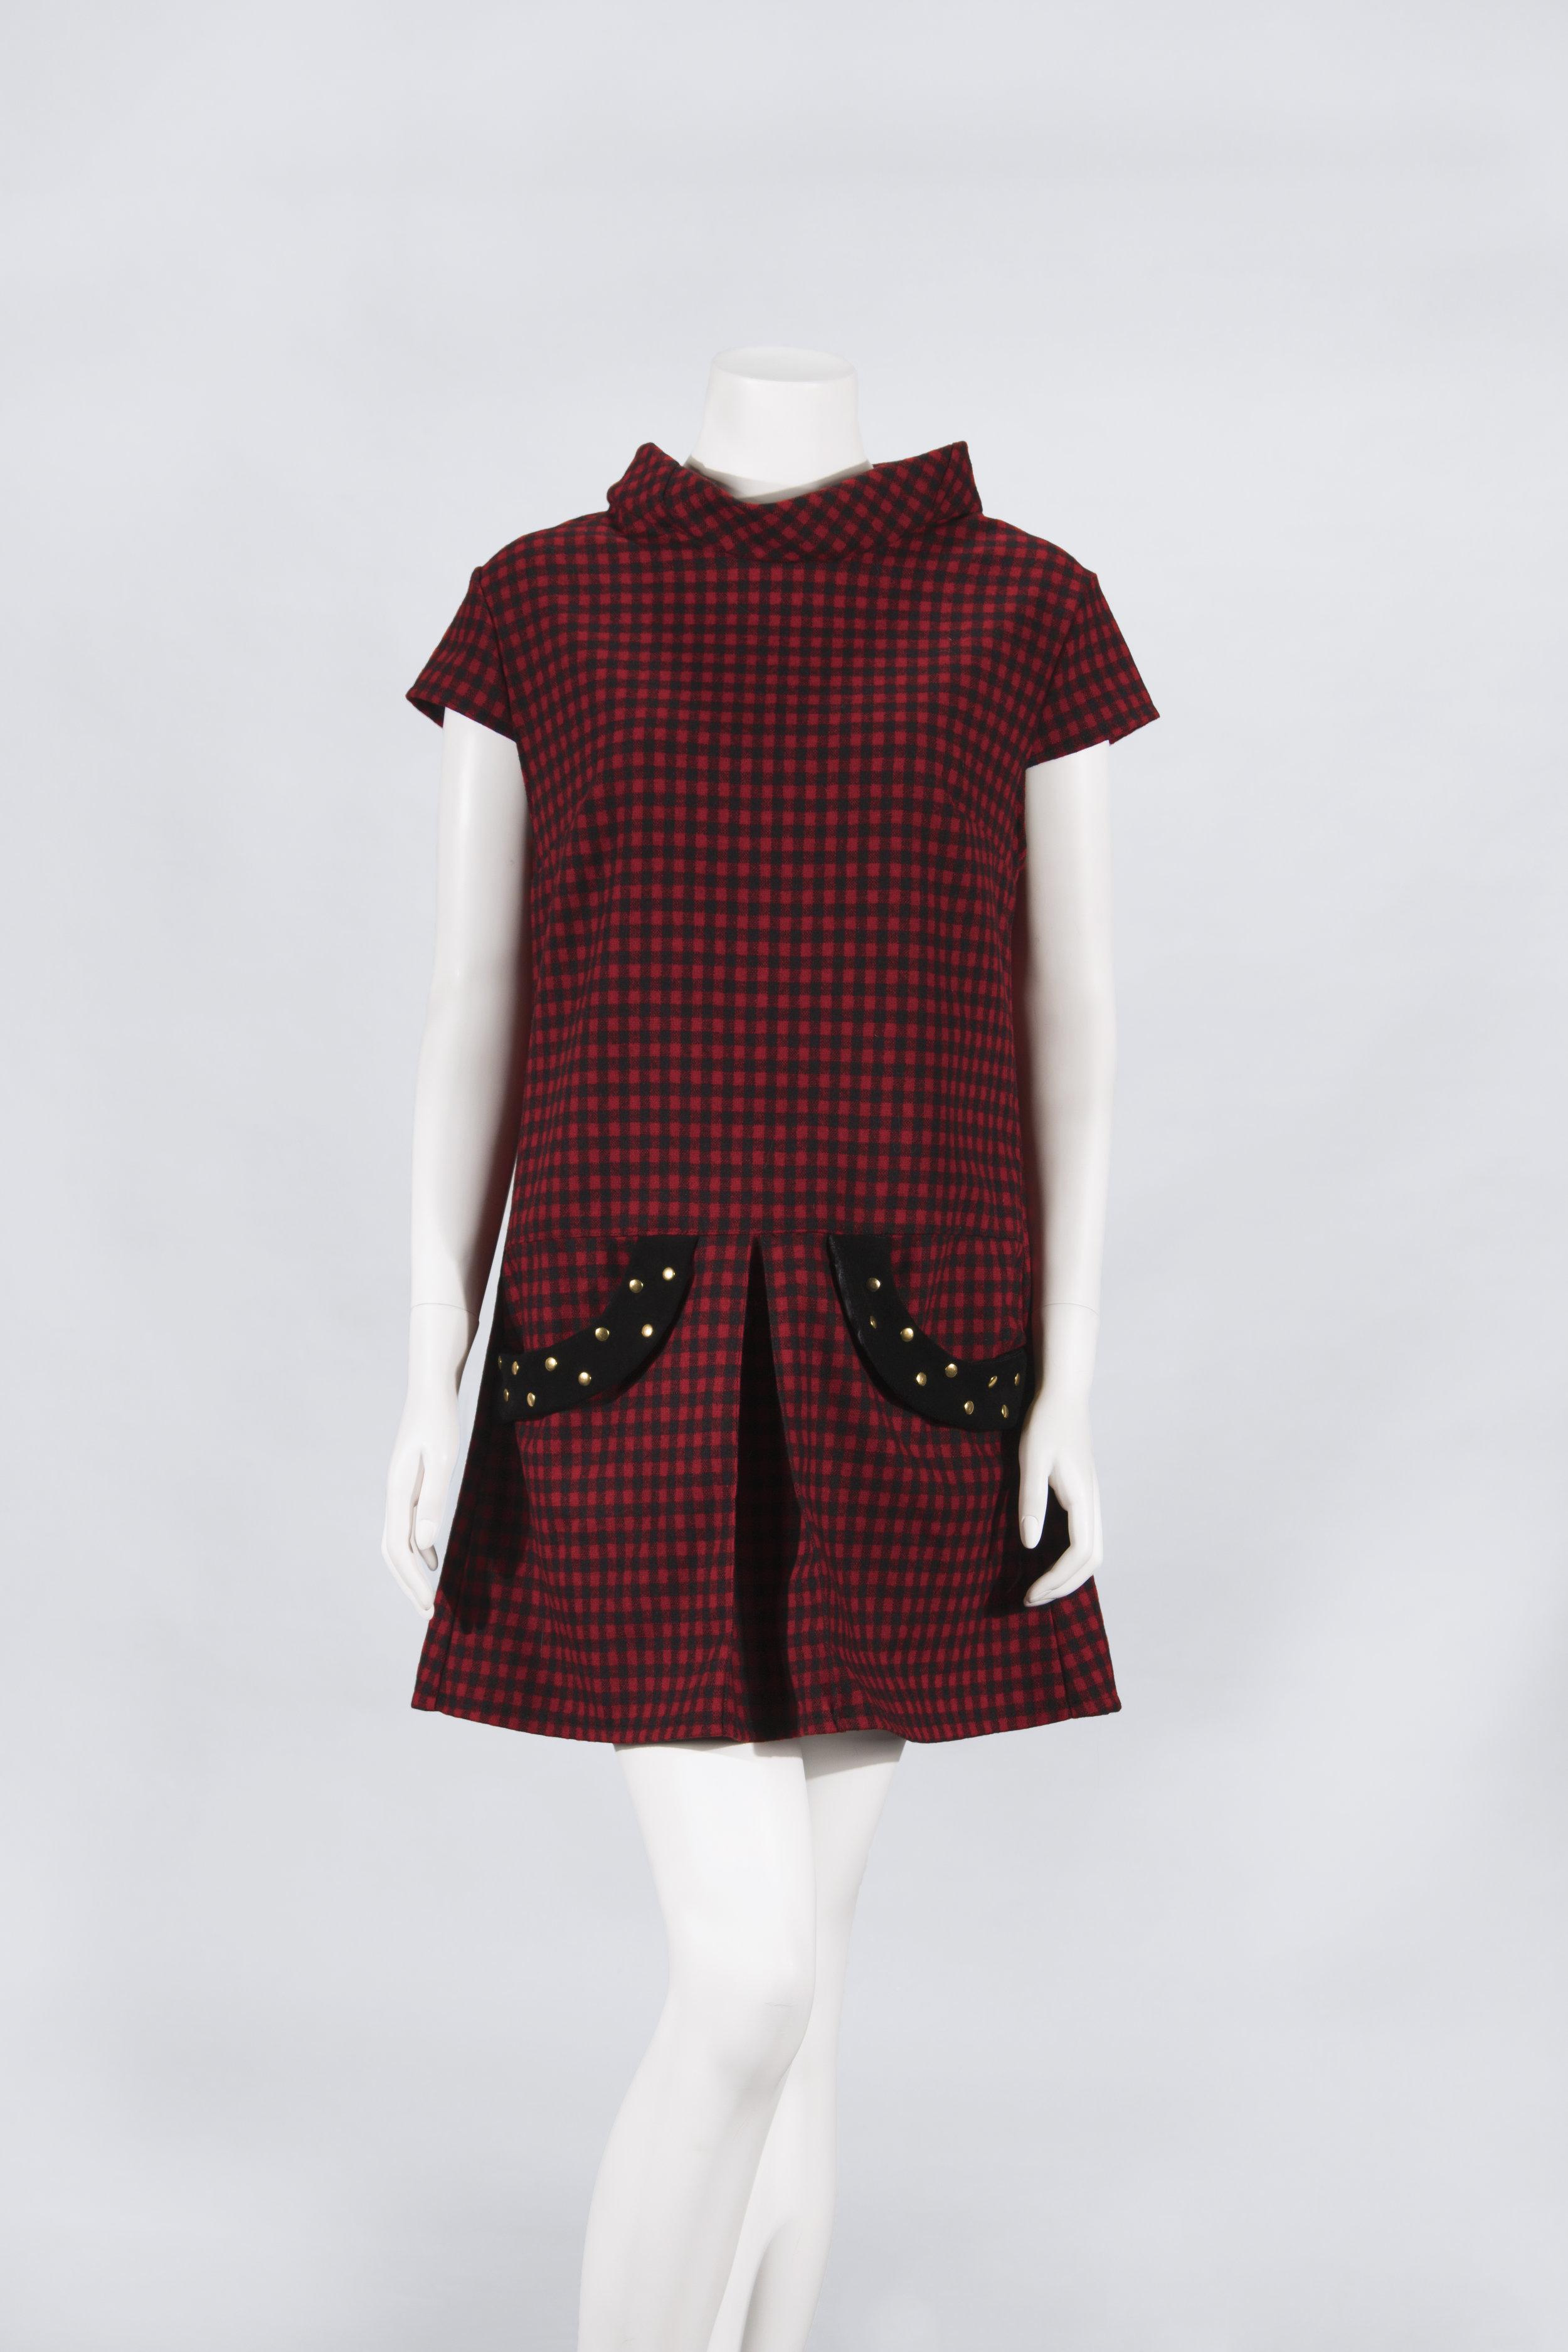 Dress 6 Front.jpg